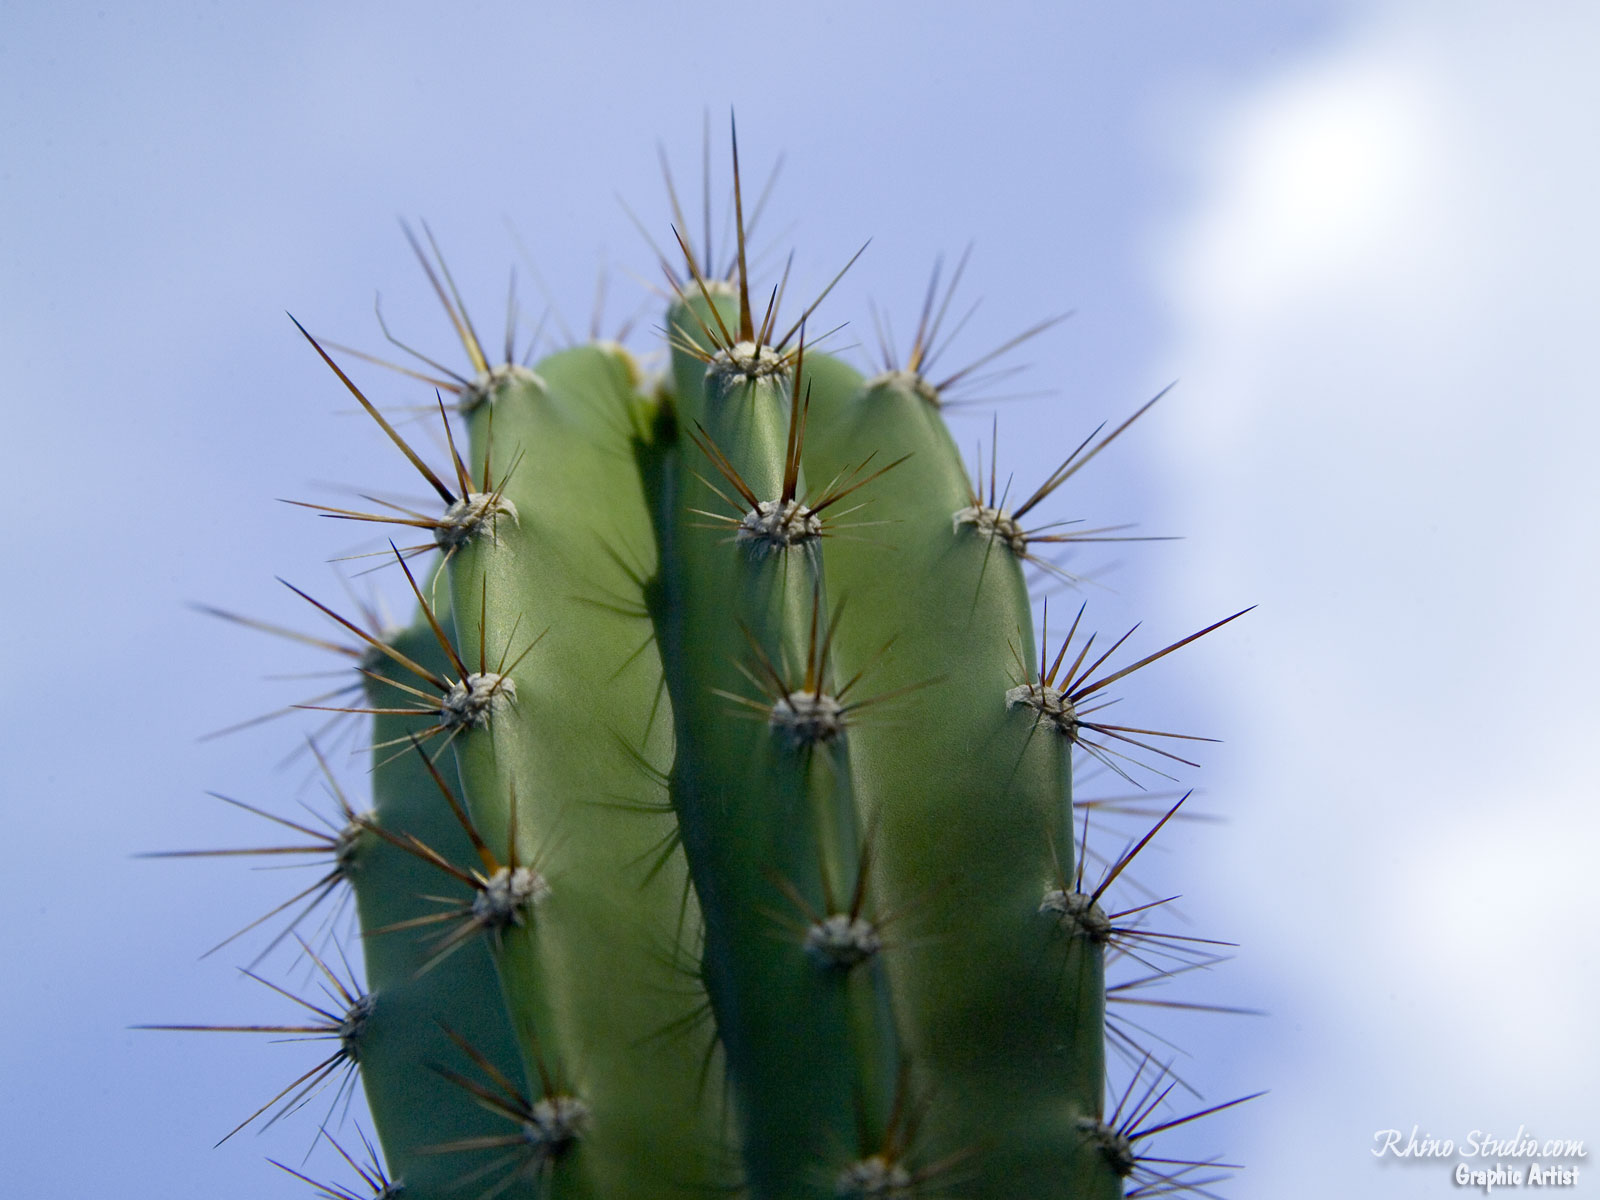 http://3.bp.blogspot.com/-3Jw2UcngB7Q/T94ruRrVZZI/AAAAAAAAIFQ/zm5jL-F-_5g/s1600/cactus%252Ccactus%2Bwallpaper%252Ccactusi%252Ccactus%2Bfoto%252Cpoze%2Bcactusi%252Cimagini%2Bcactus.png